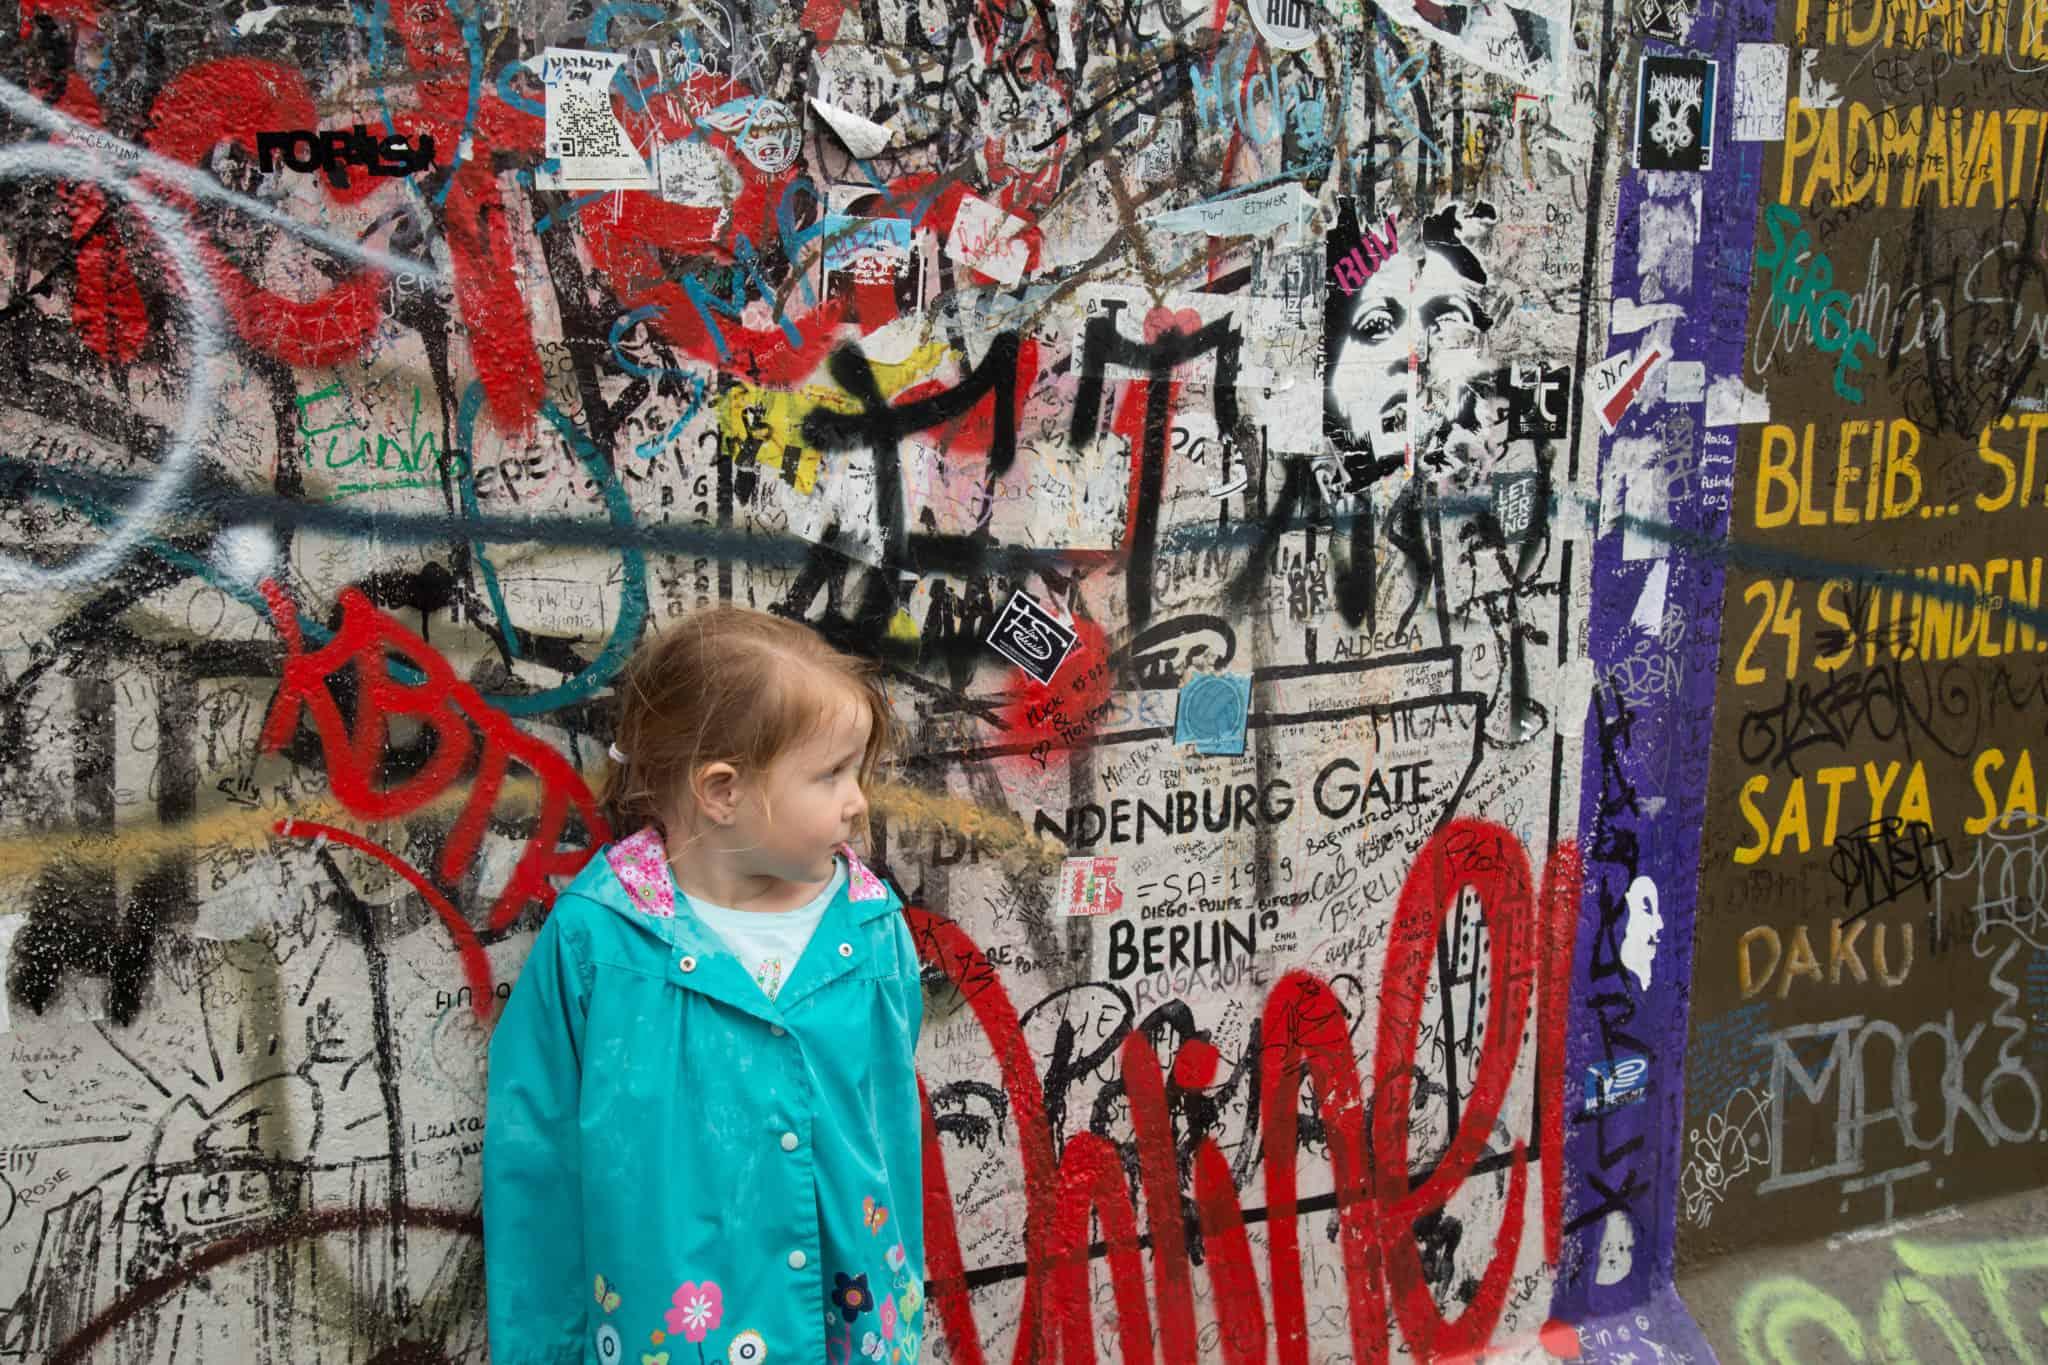 Travel with kids - Berlin Wall - Berlin - Germany